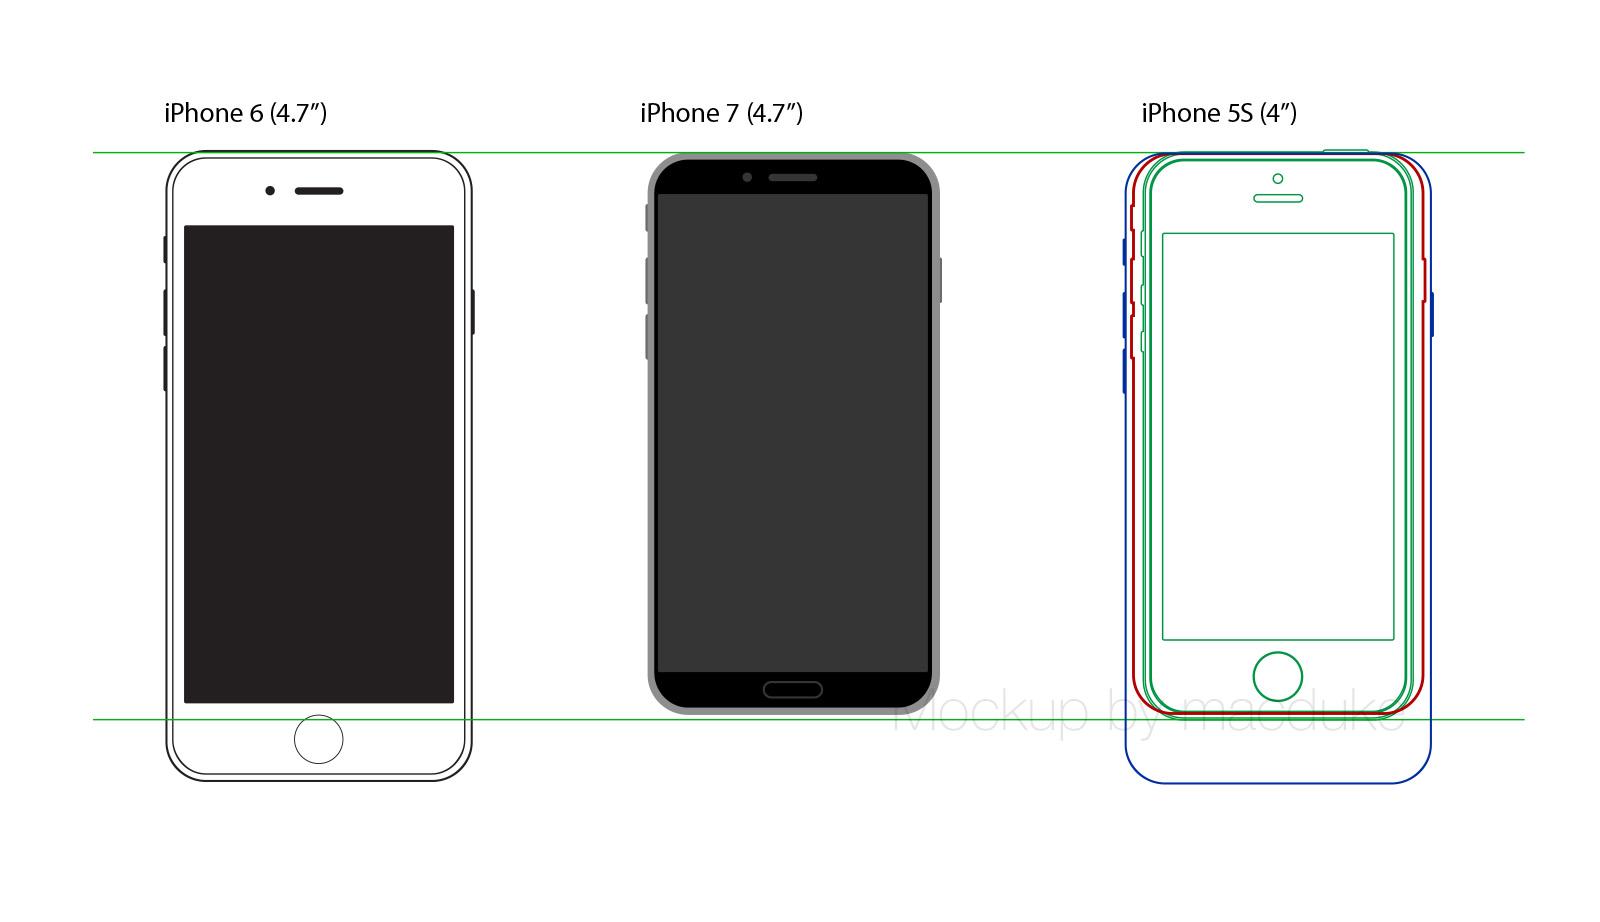 iPhone-sizes-new.jpg